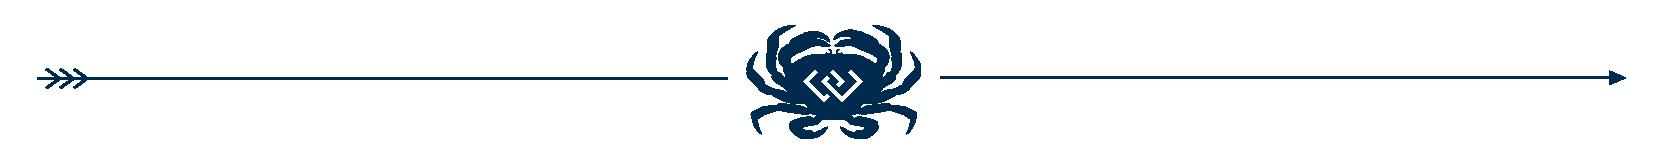 crab-banner-blue-04